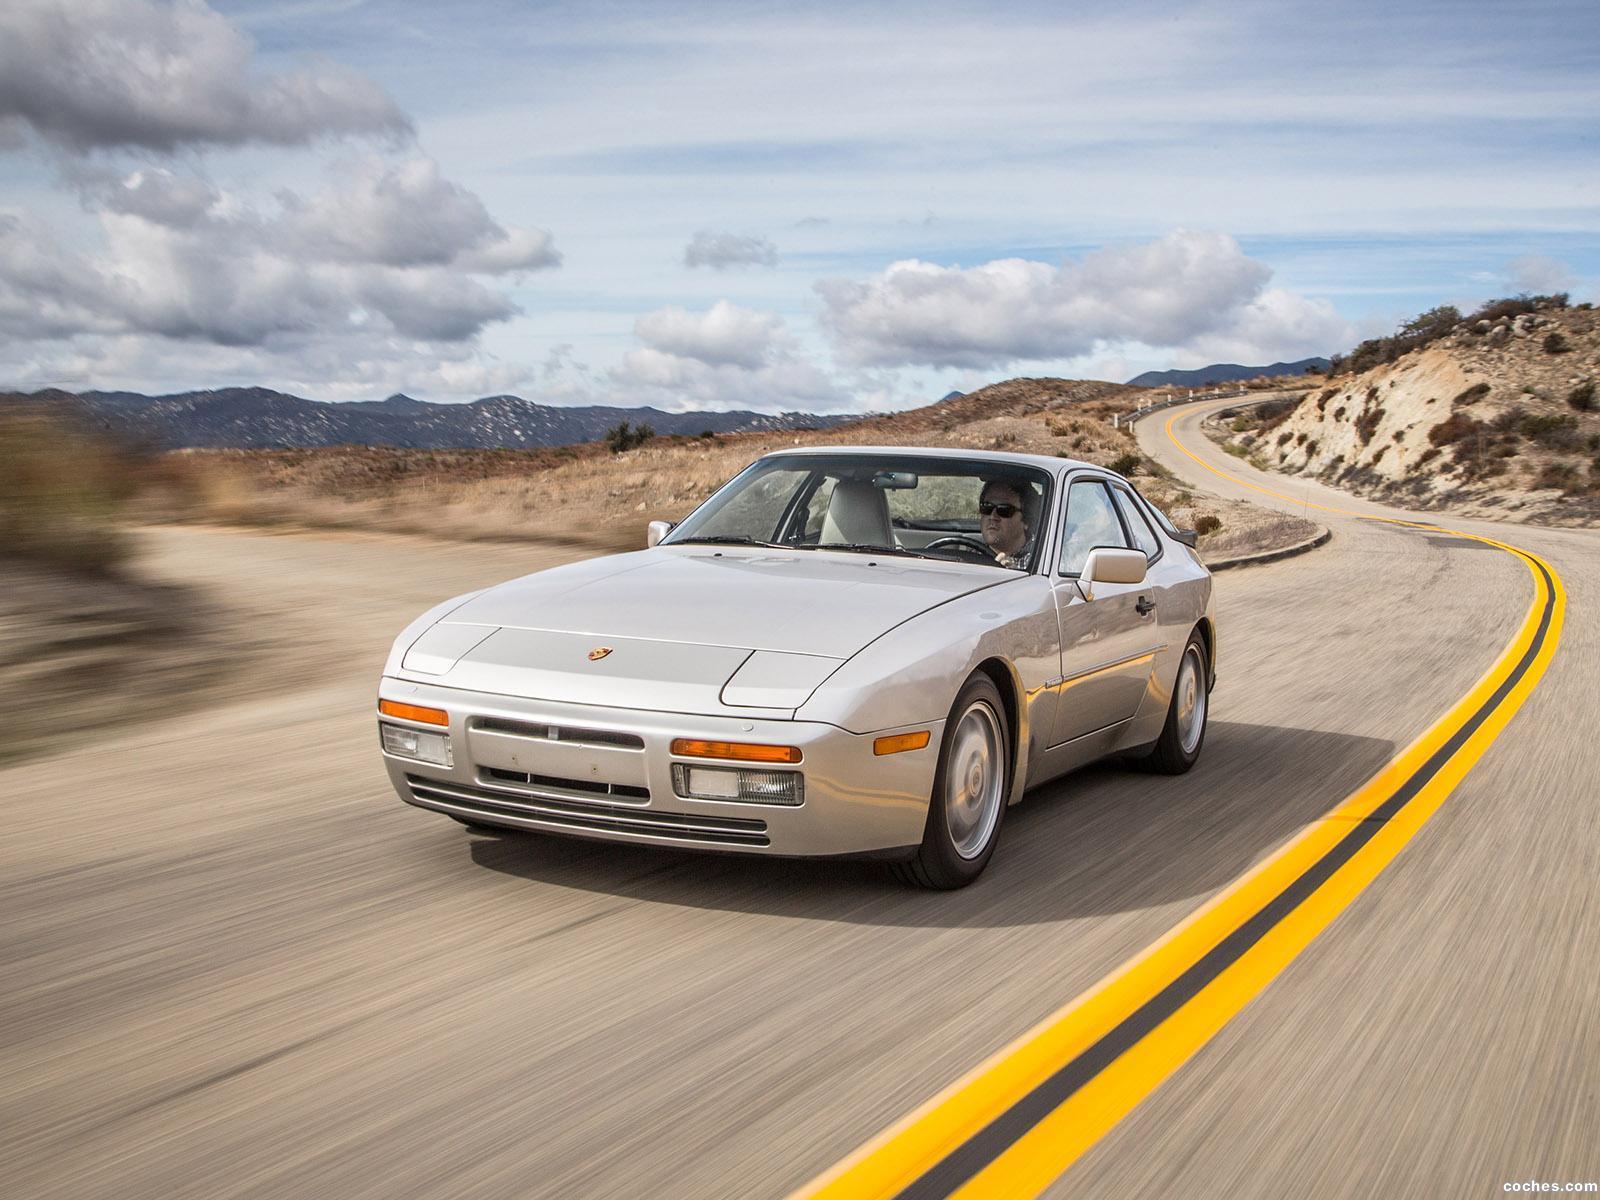 Foto 17 de Porsche 944 S2 USA 1989